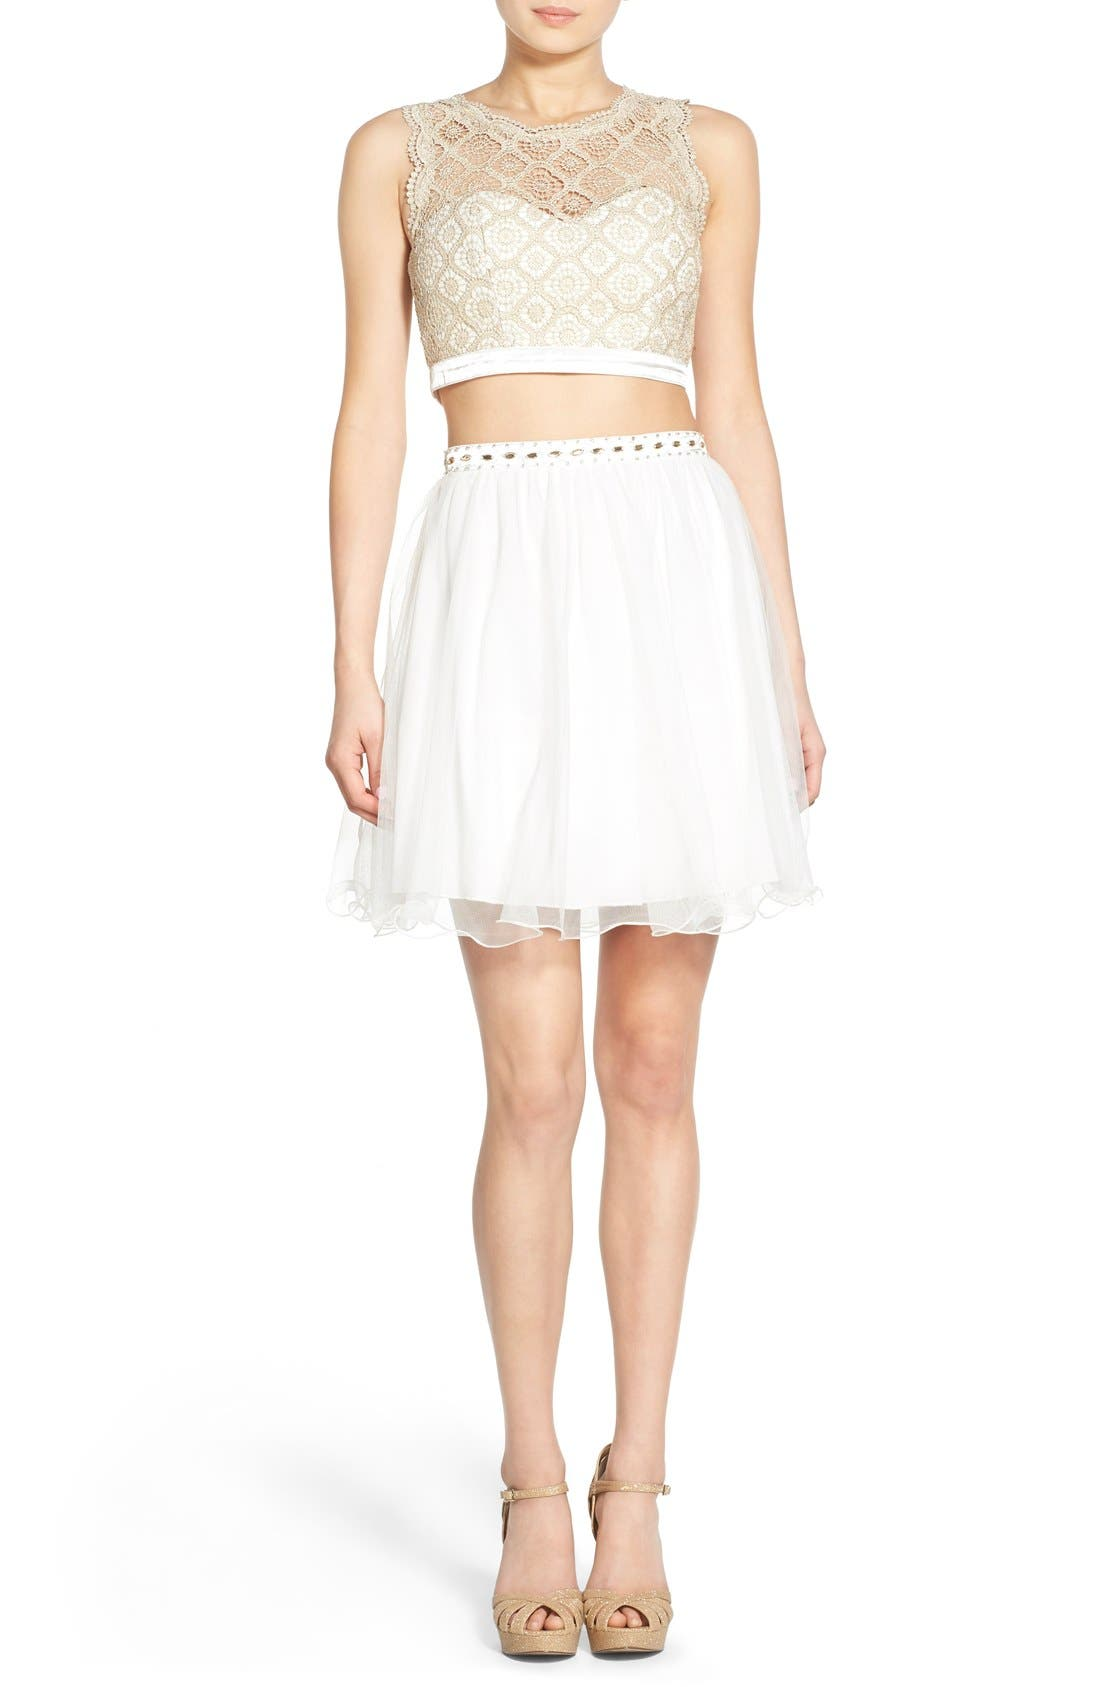 Main Image - Sequin Hearts Crochet Lace Two-Piece Dress